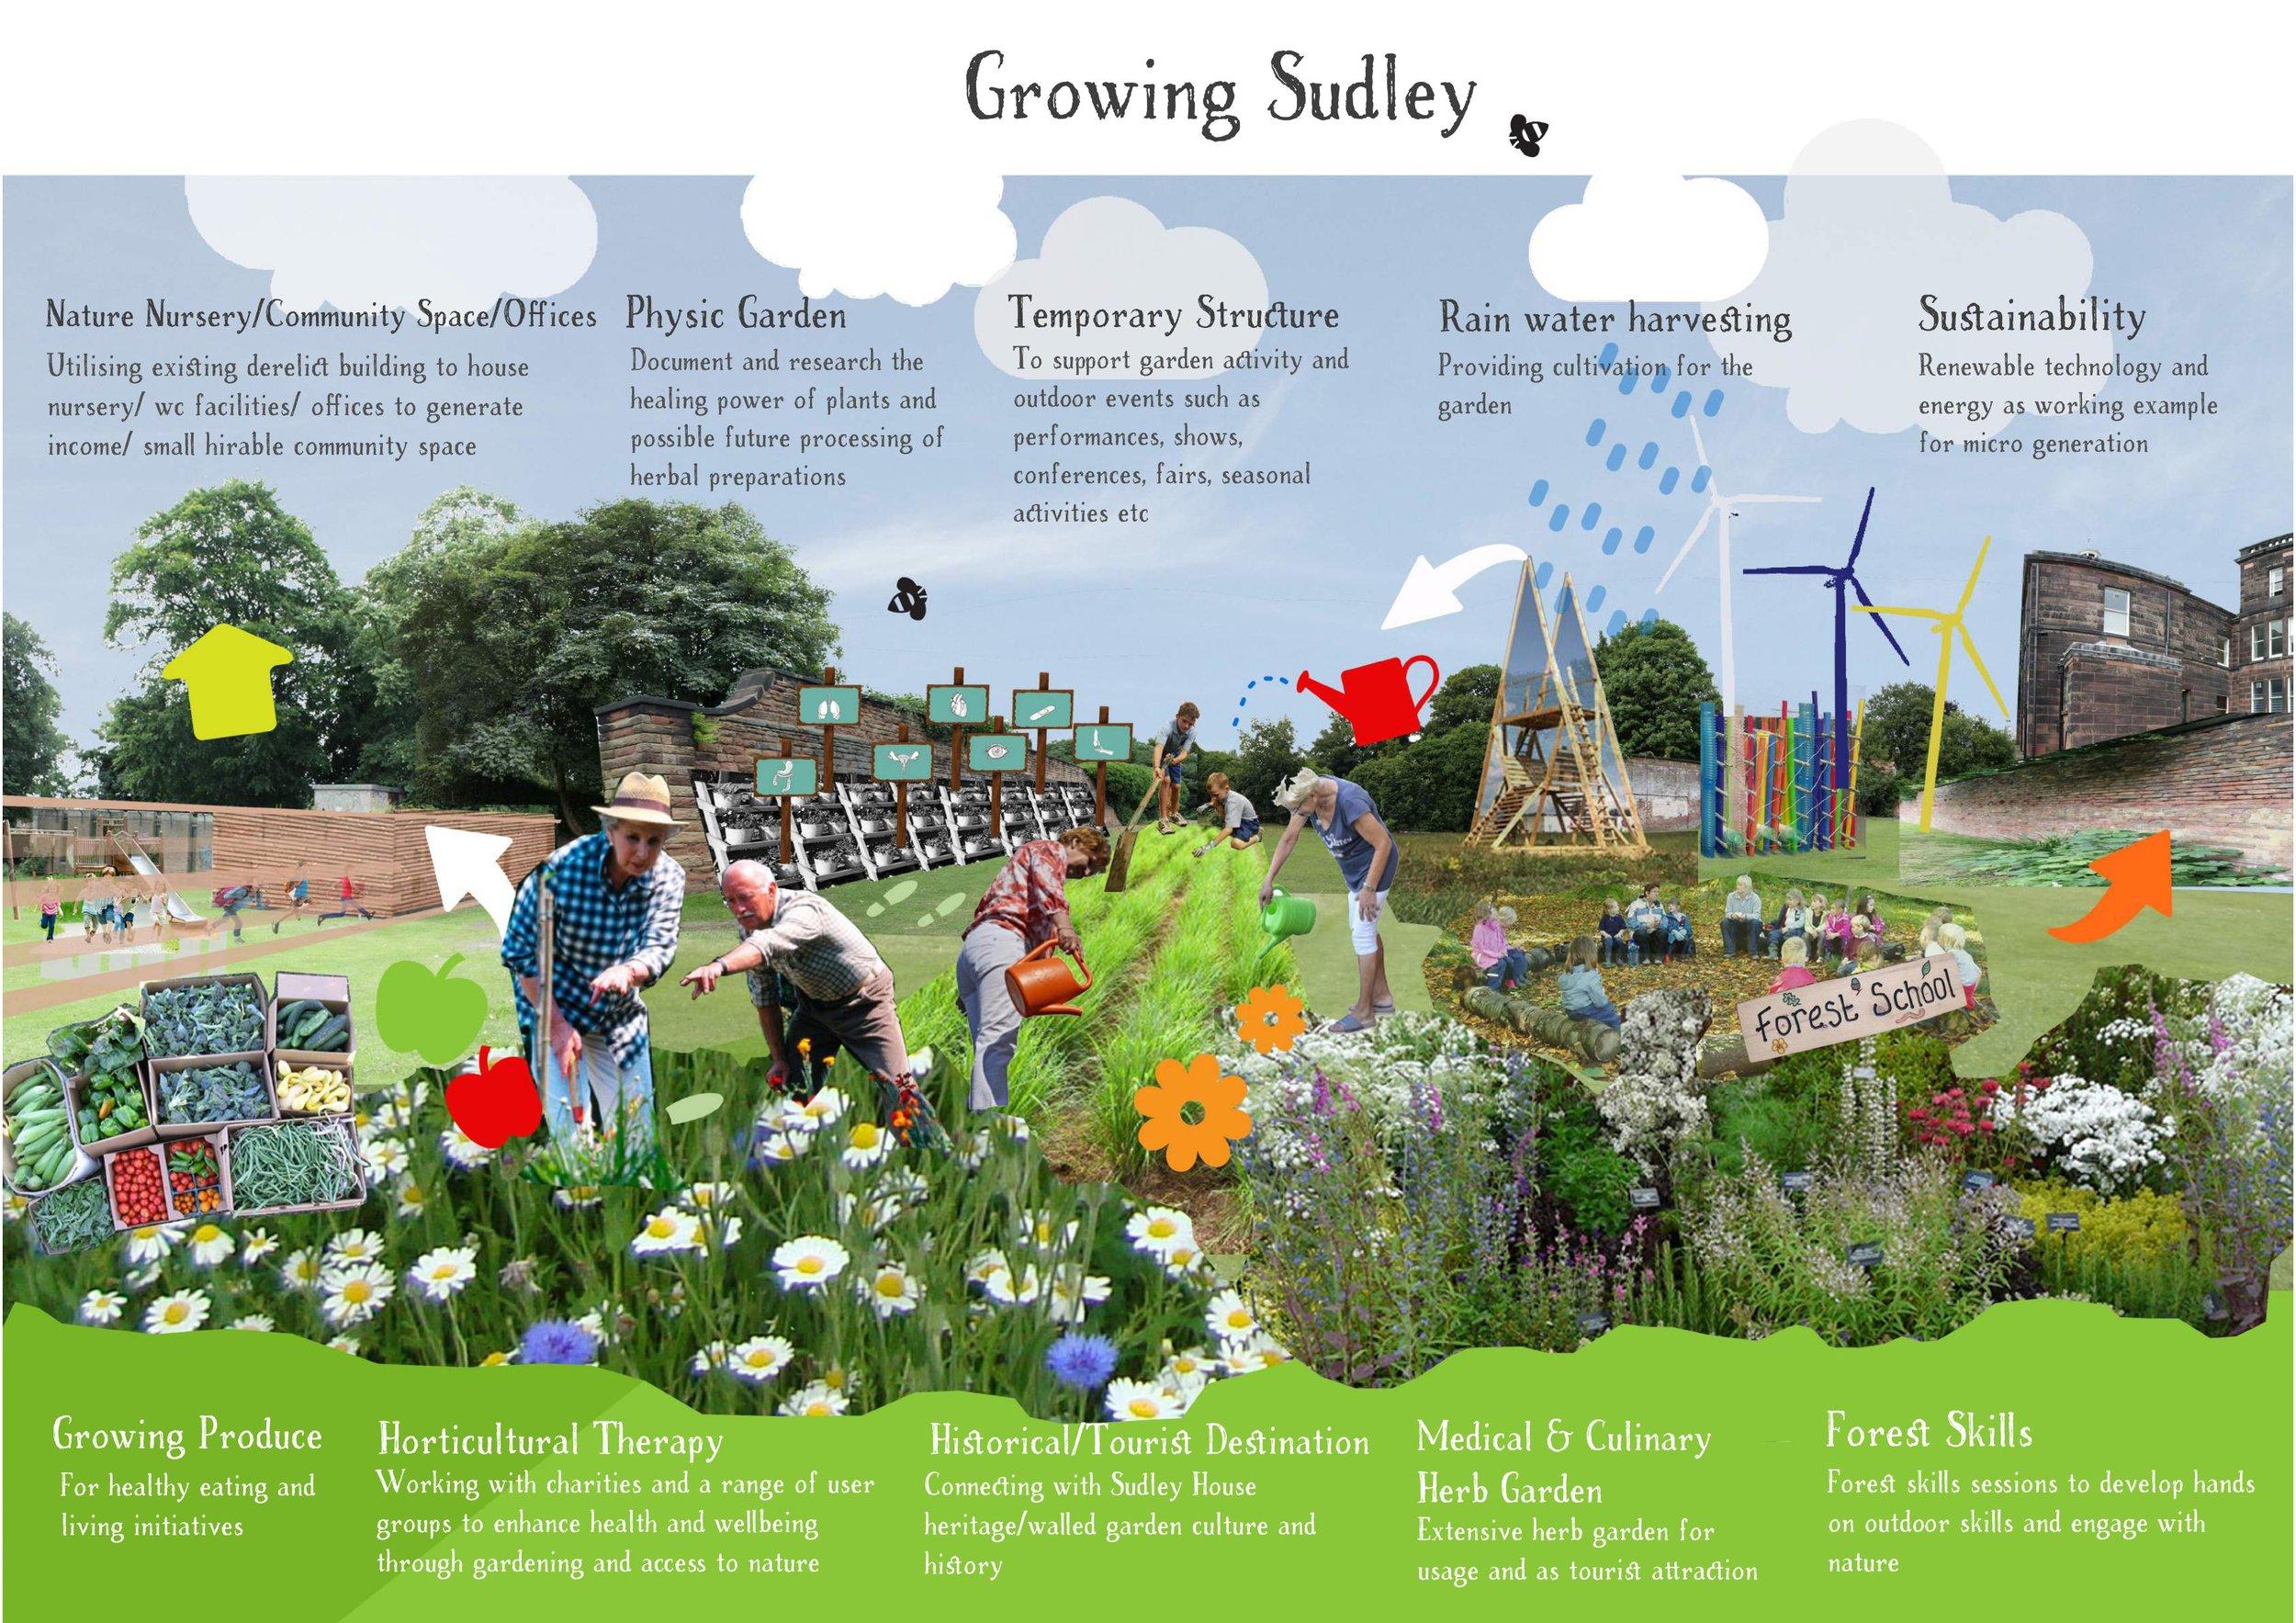 Growing Sudley Final Collage JPEG.jpg